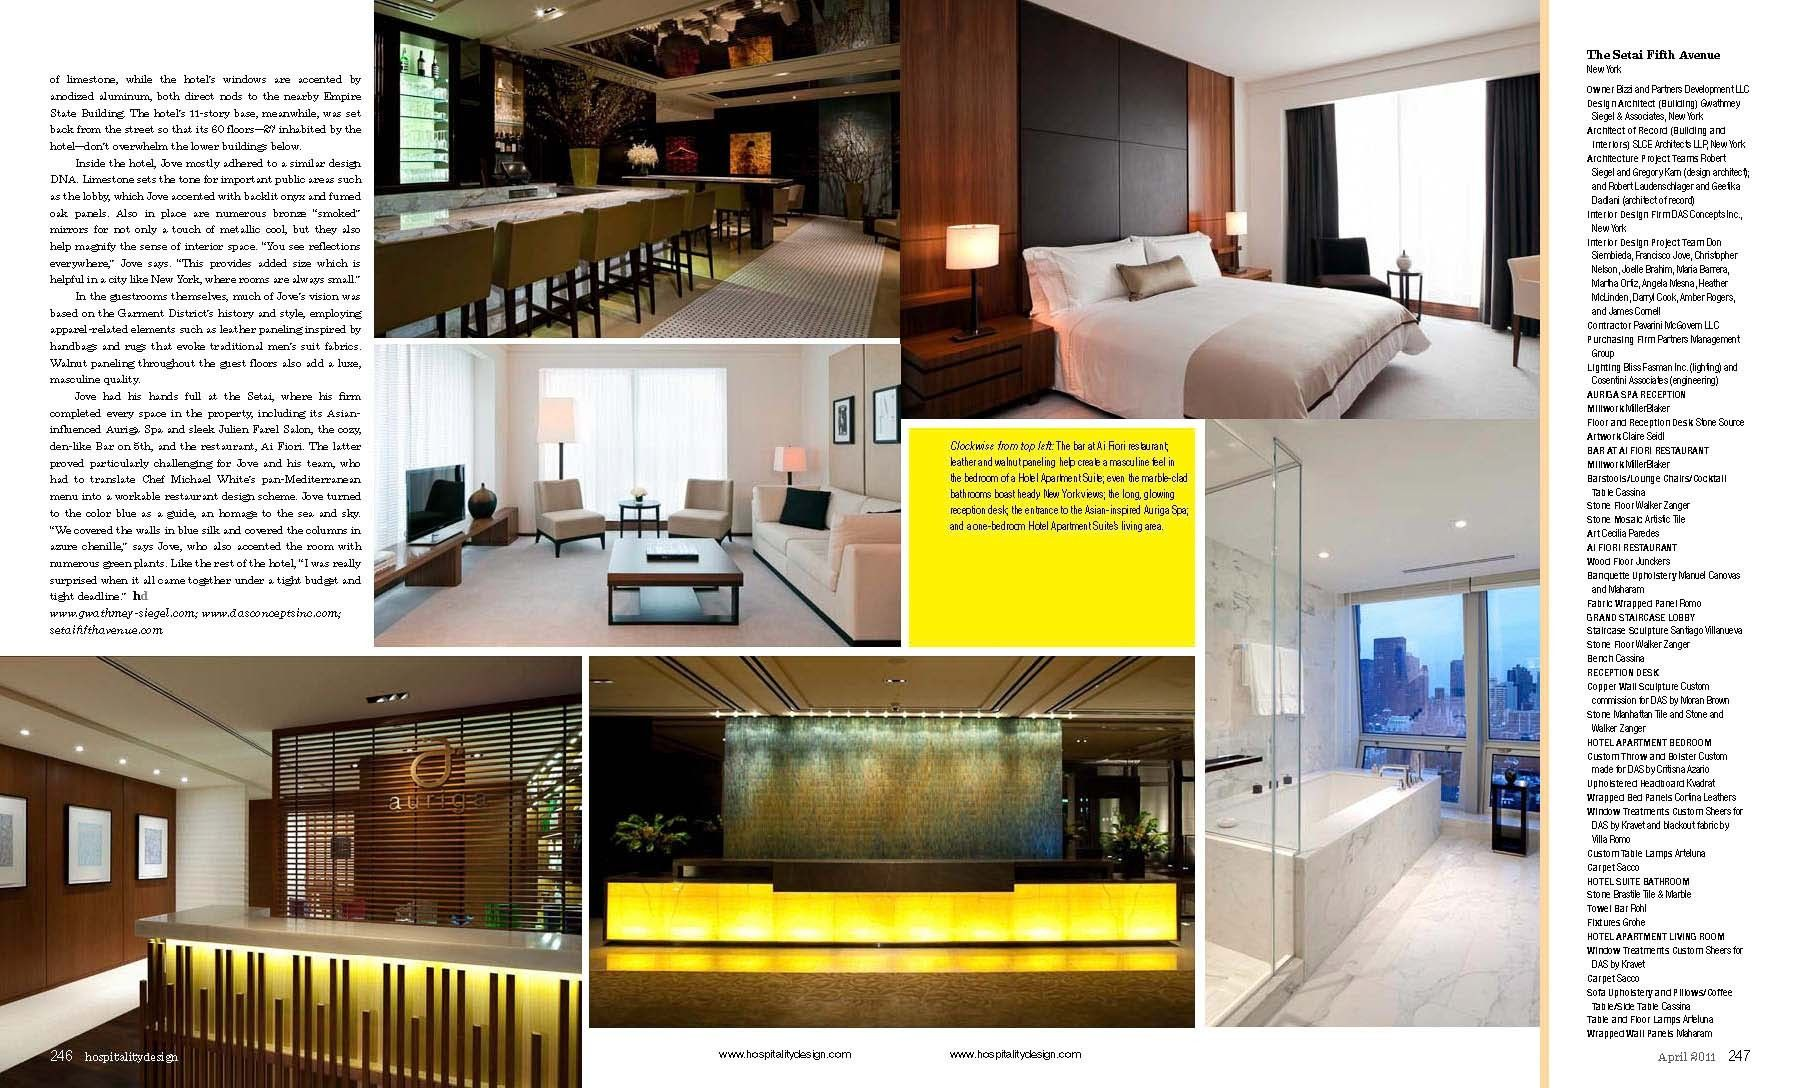 Hospitality Design April 2011